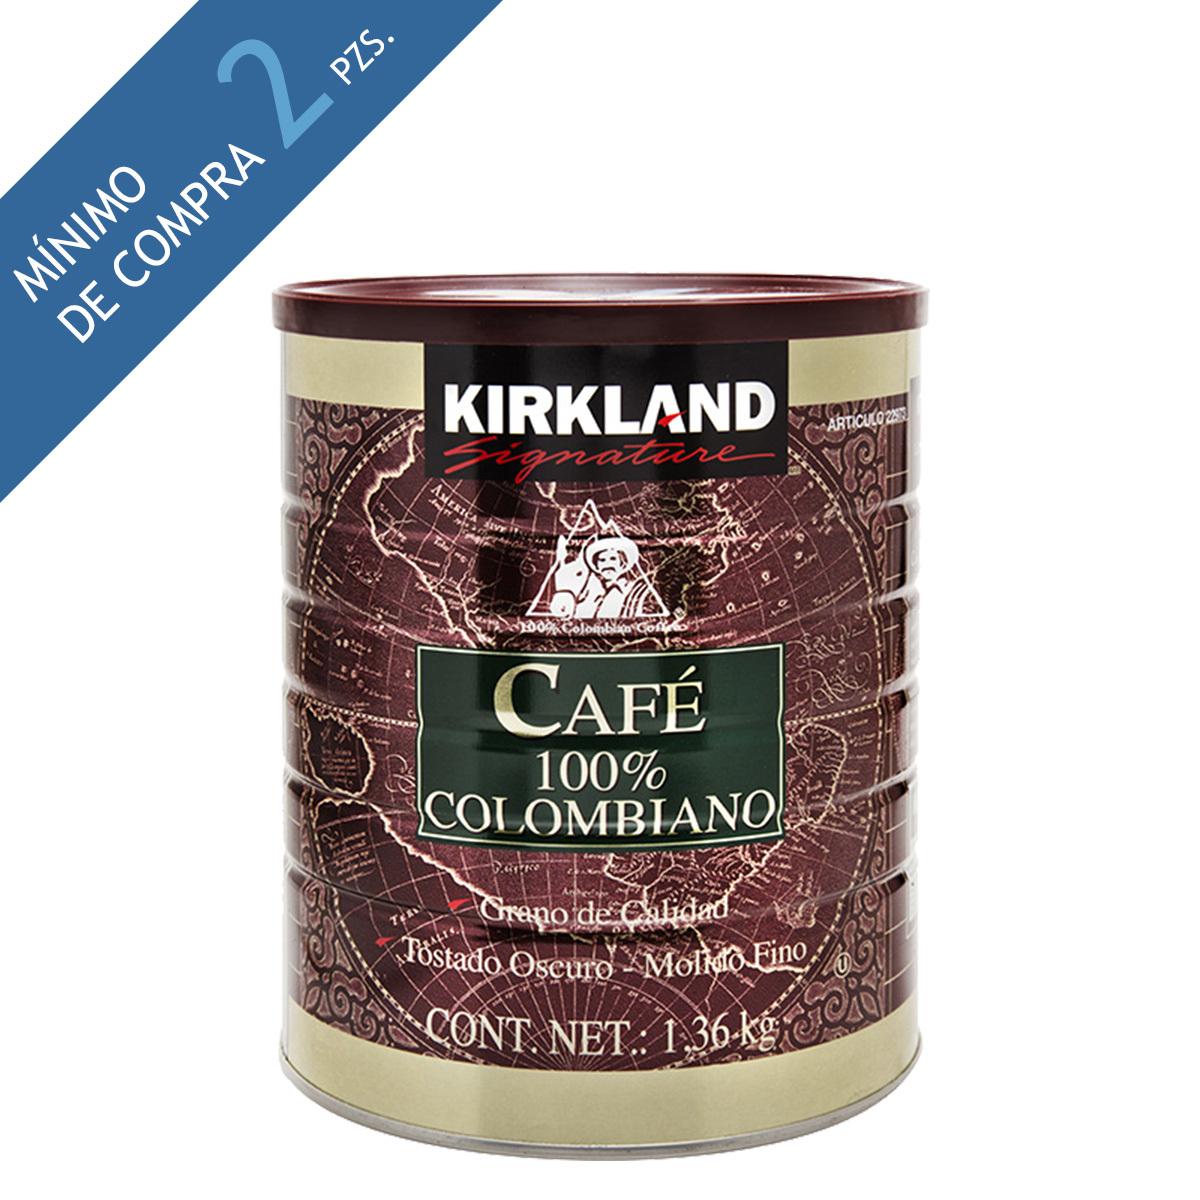 Costco: Kirkland Signature café molido 100% colombiano 1.36kg